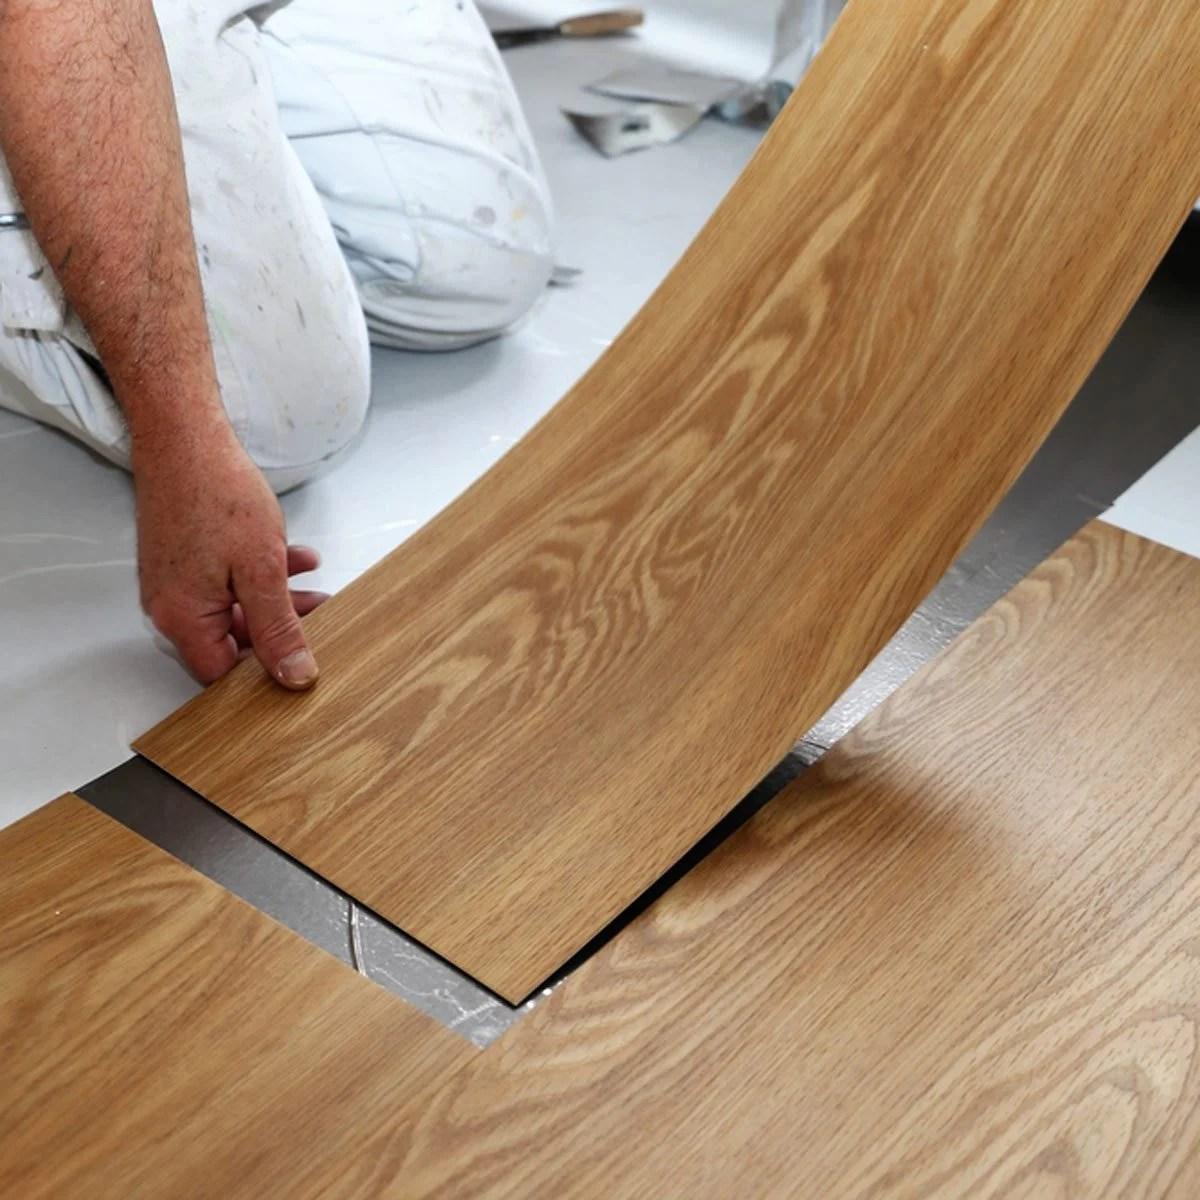 Inexpensive Flooring Options Cheap Flooring Ideas Instead Of Hardwood Family Handyman